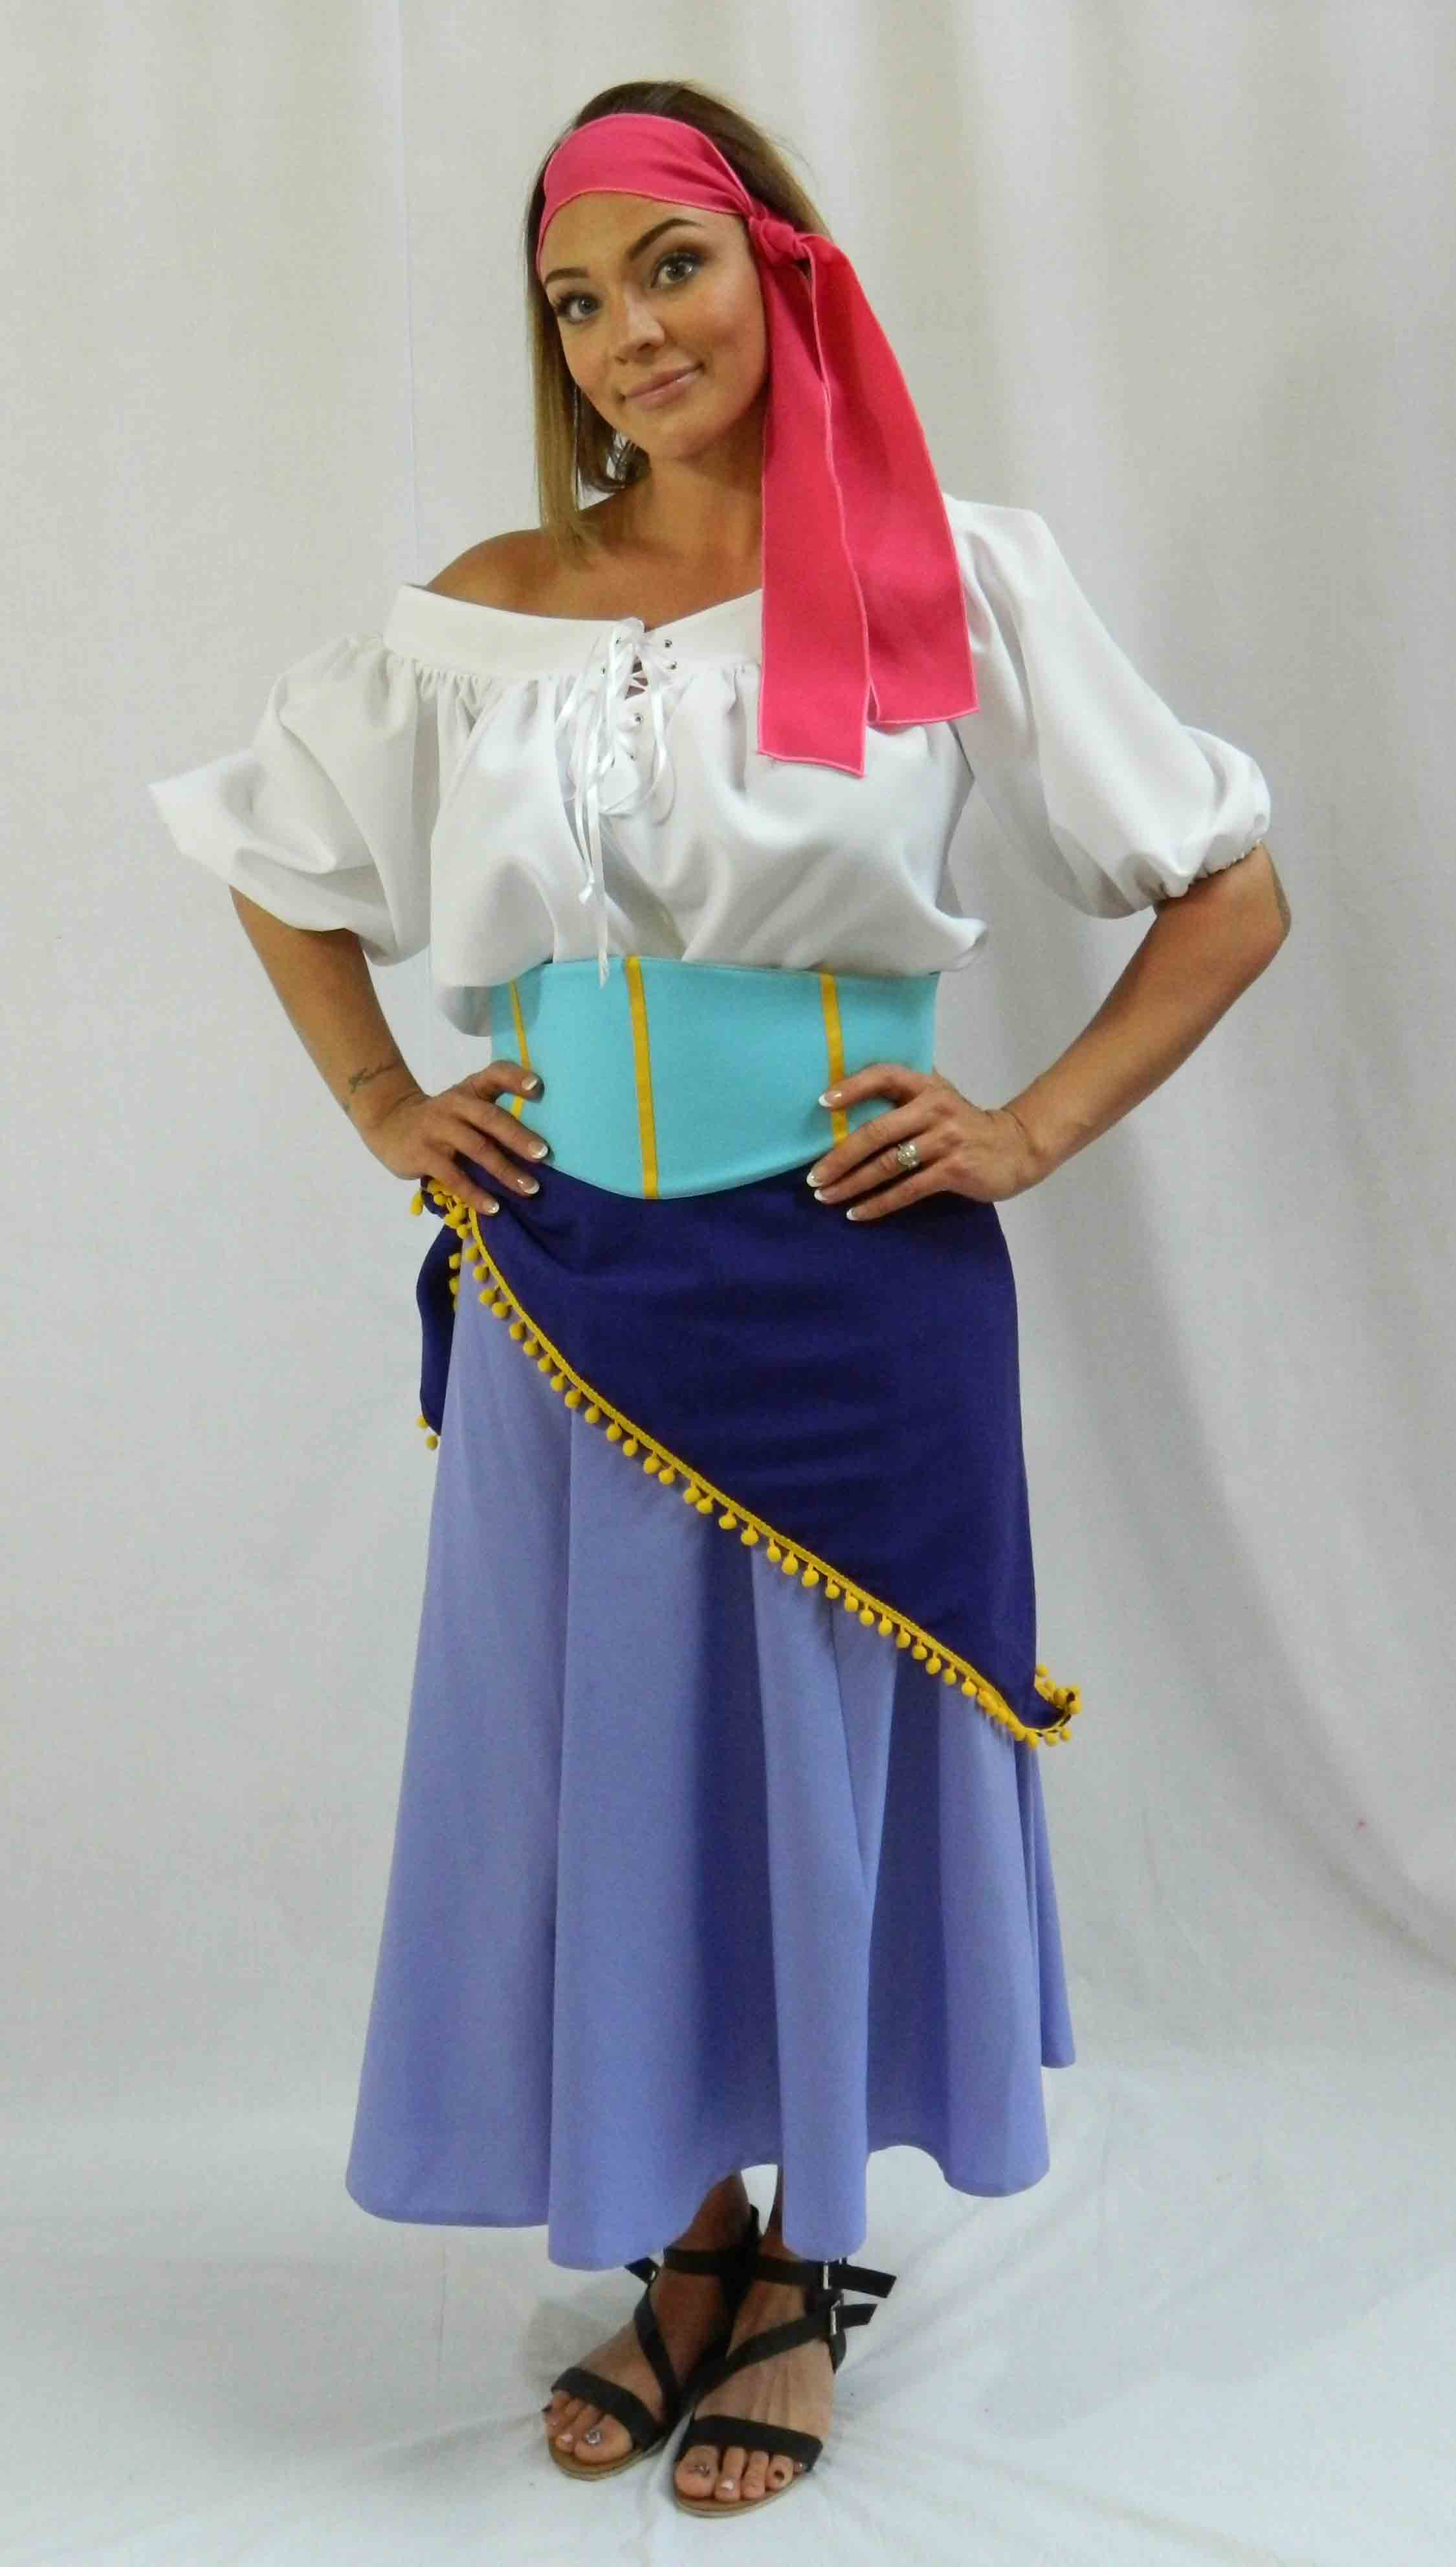 Greatest Showman Fancy Dress · Deluxe Greatest Showman Costume · Esmerelda